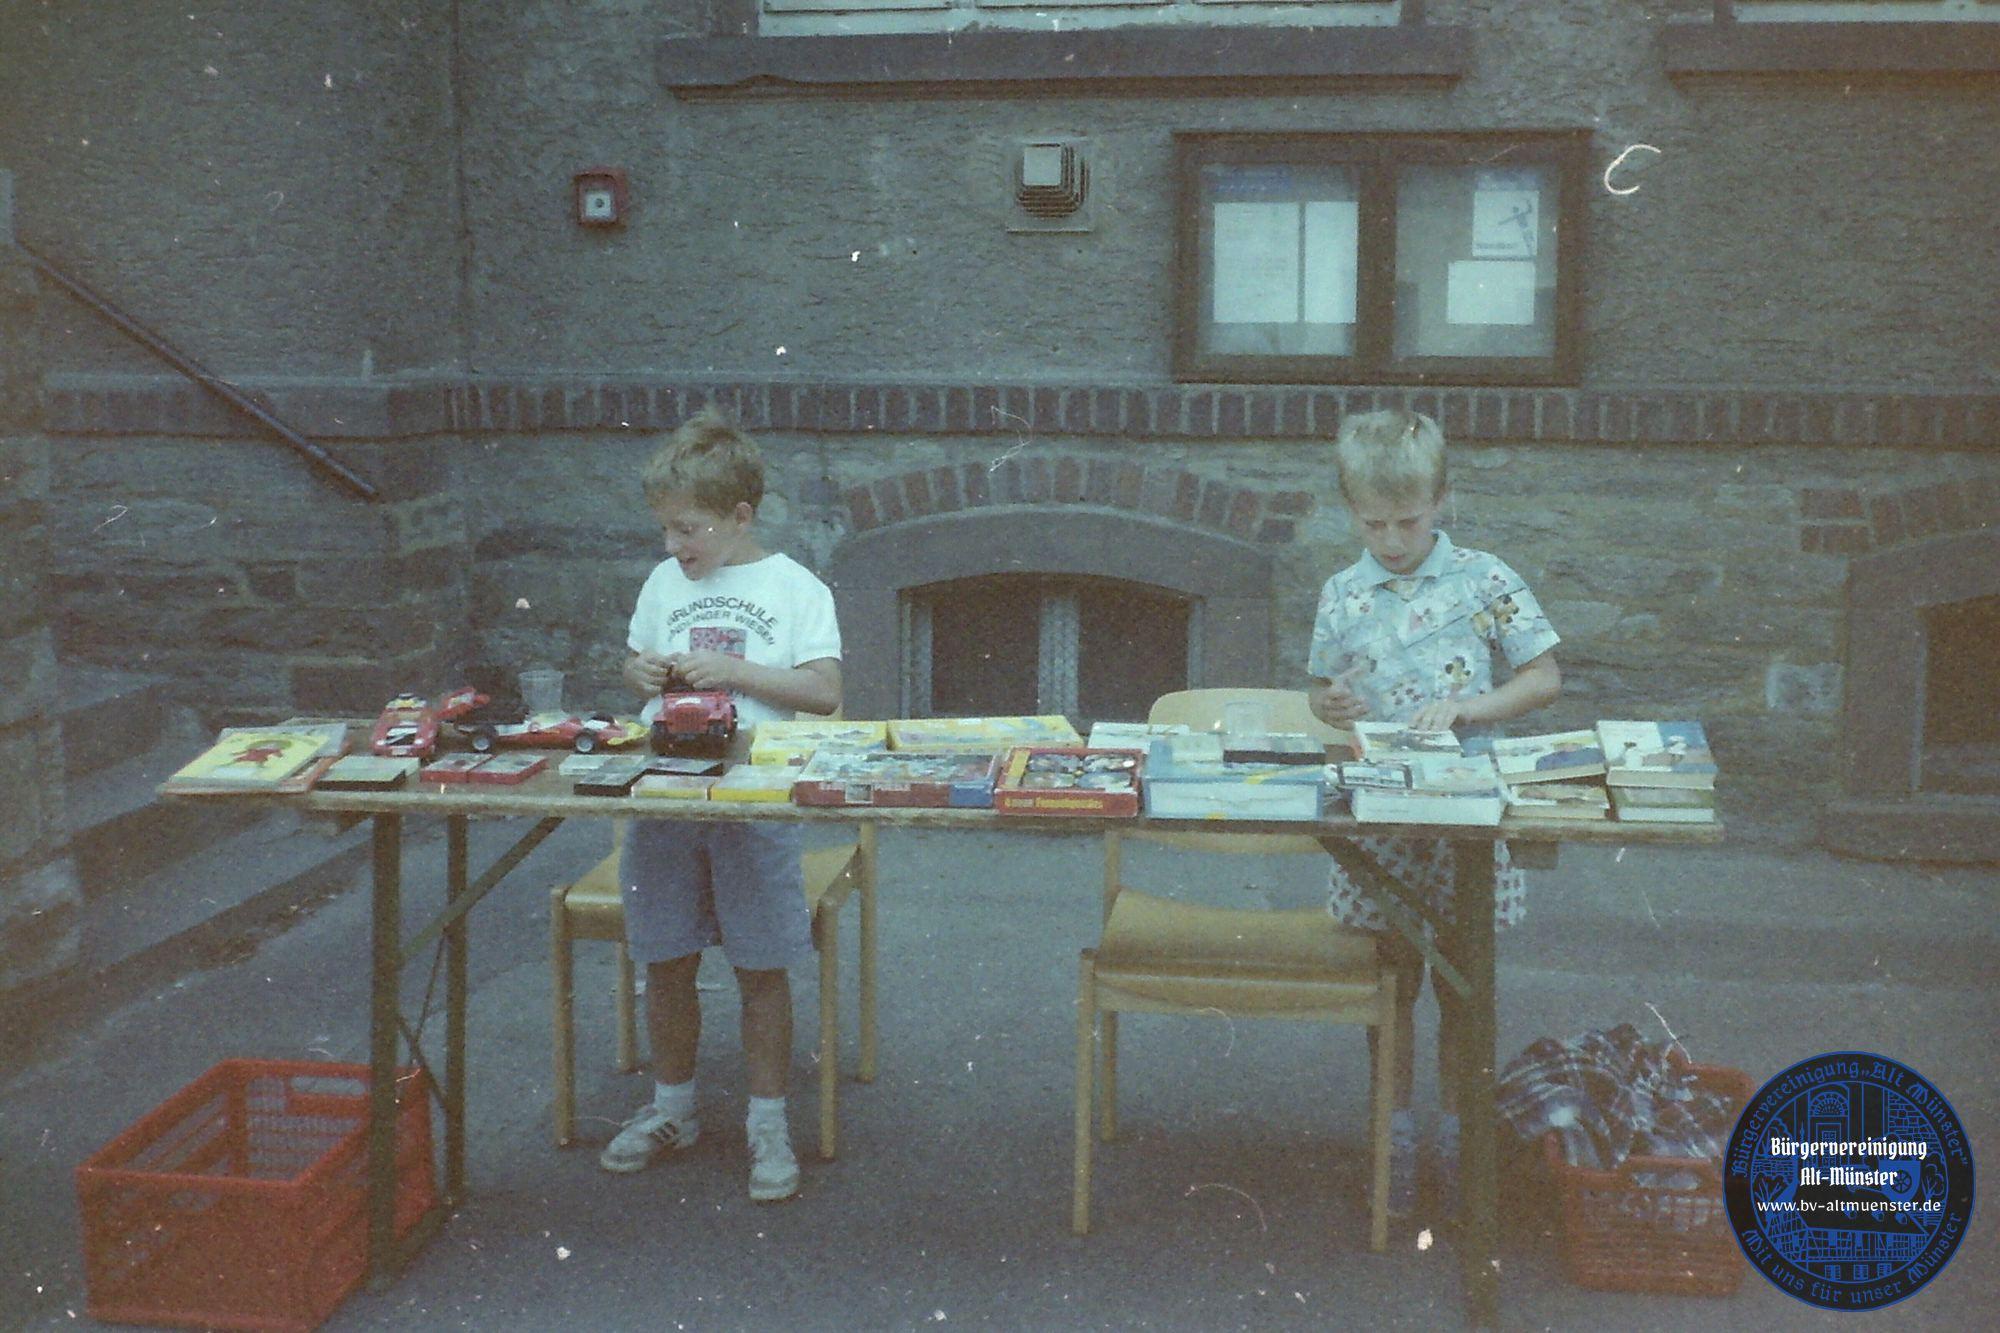 1989: Dallesfest · BVAM · Bürgervereinigung Alt-Münster e.V.